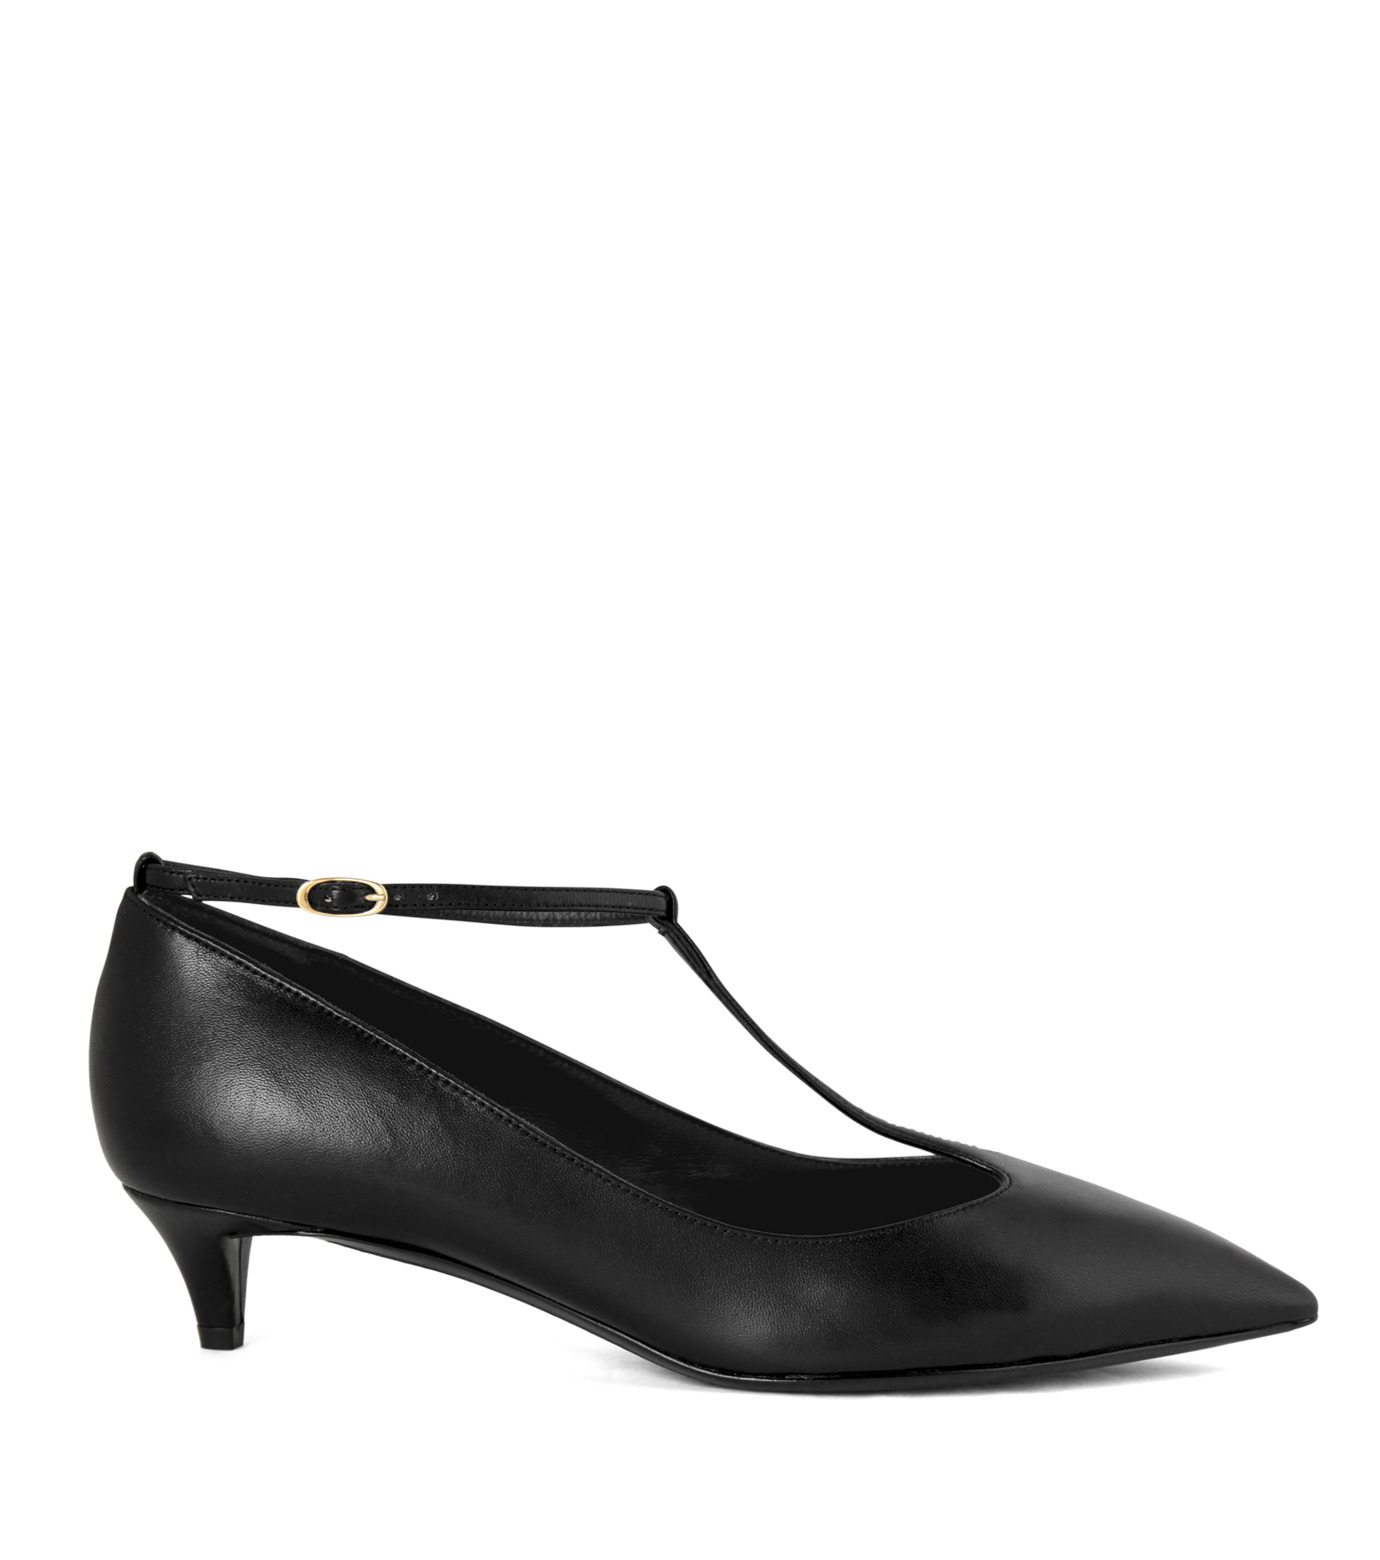 Giuseppe Zanotti Design(ジュゼッペザノッティ)のKitten Heel T-Strap Pump-BLACK(シューズ/shoes)-42-6082NP035-13 拡大詳細画像1